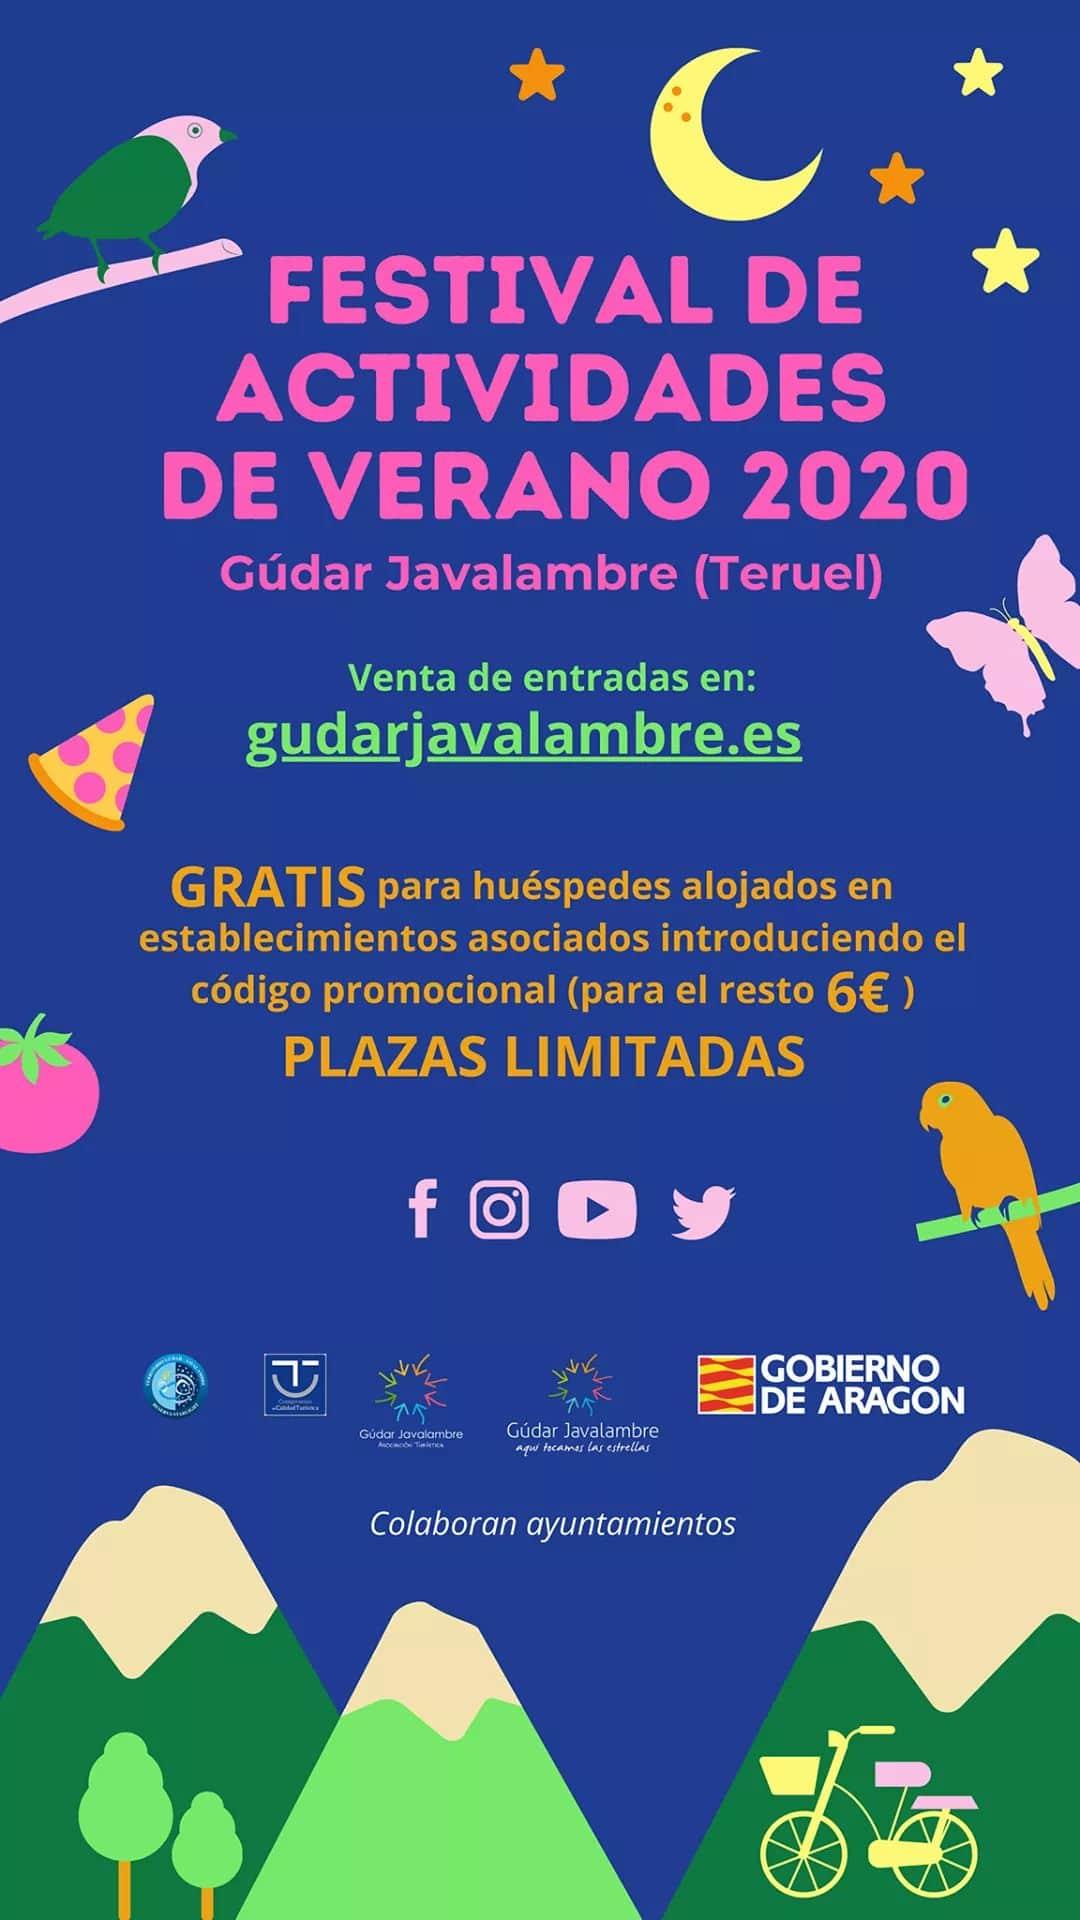 festival actividades verano gudar javalambre 2020